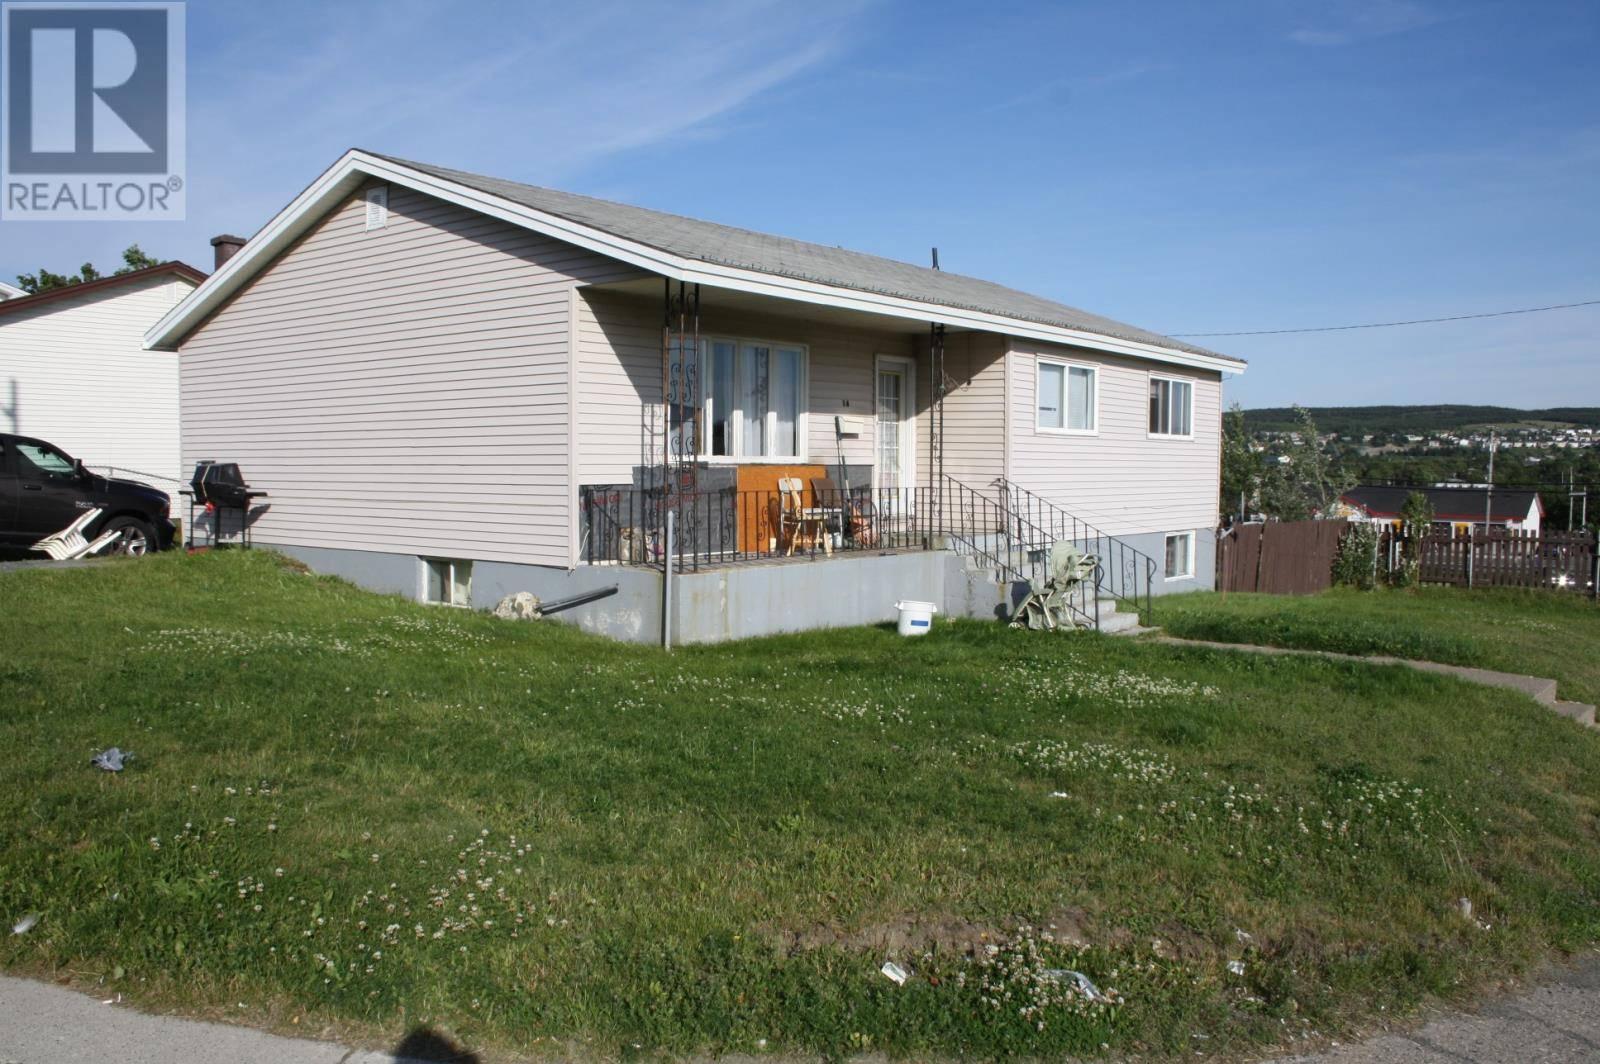 House for sale at 14 Burgeo St St. John's Newfoundland - MLS: 1209912